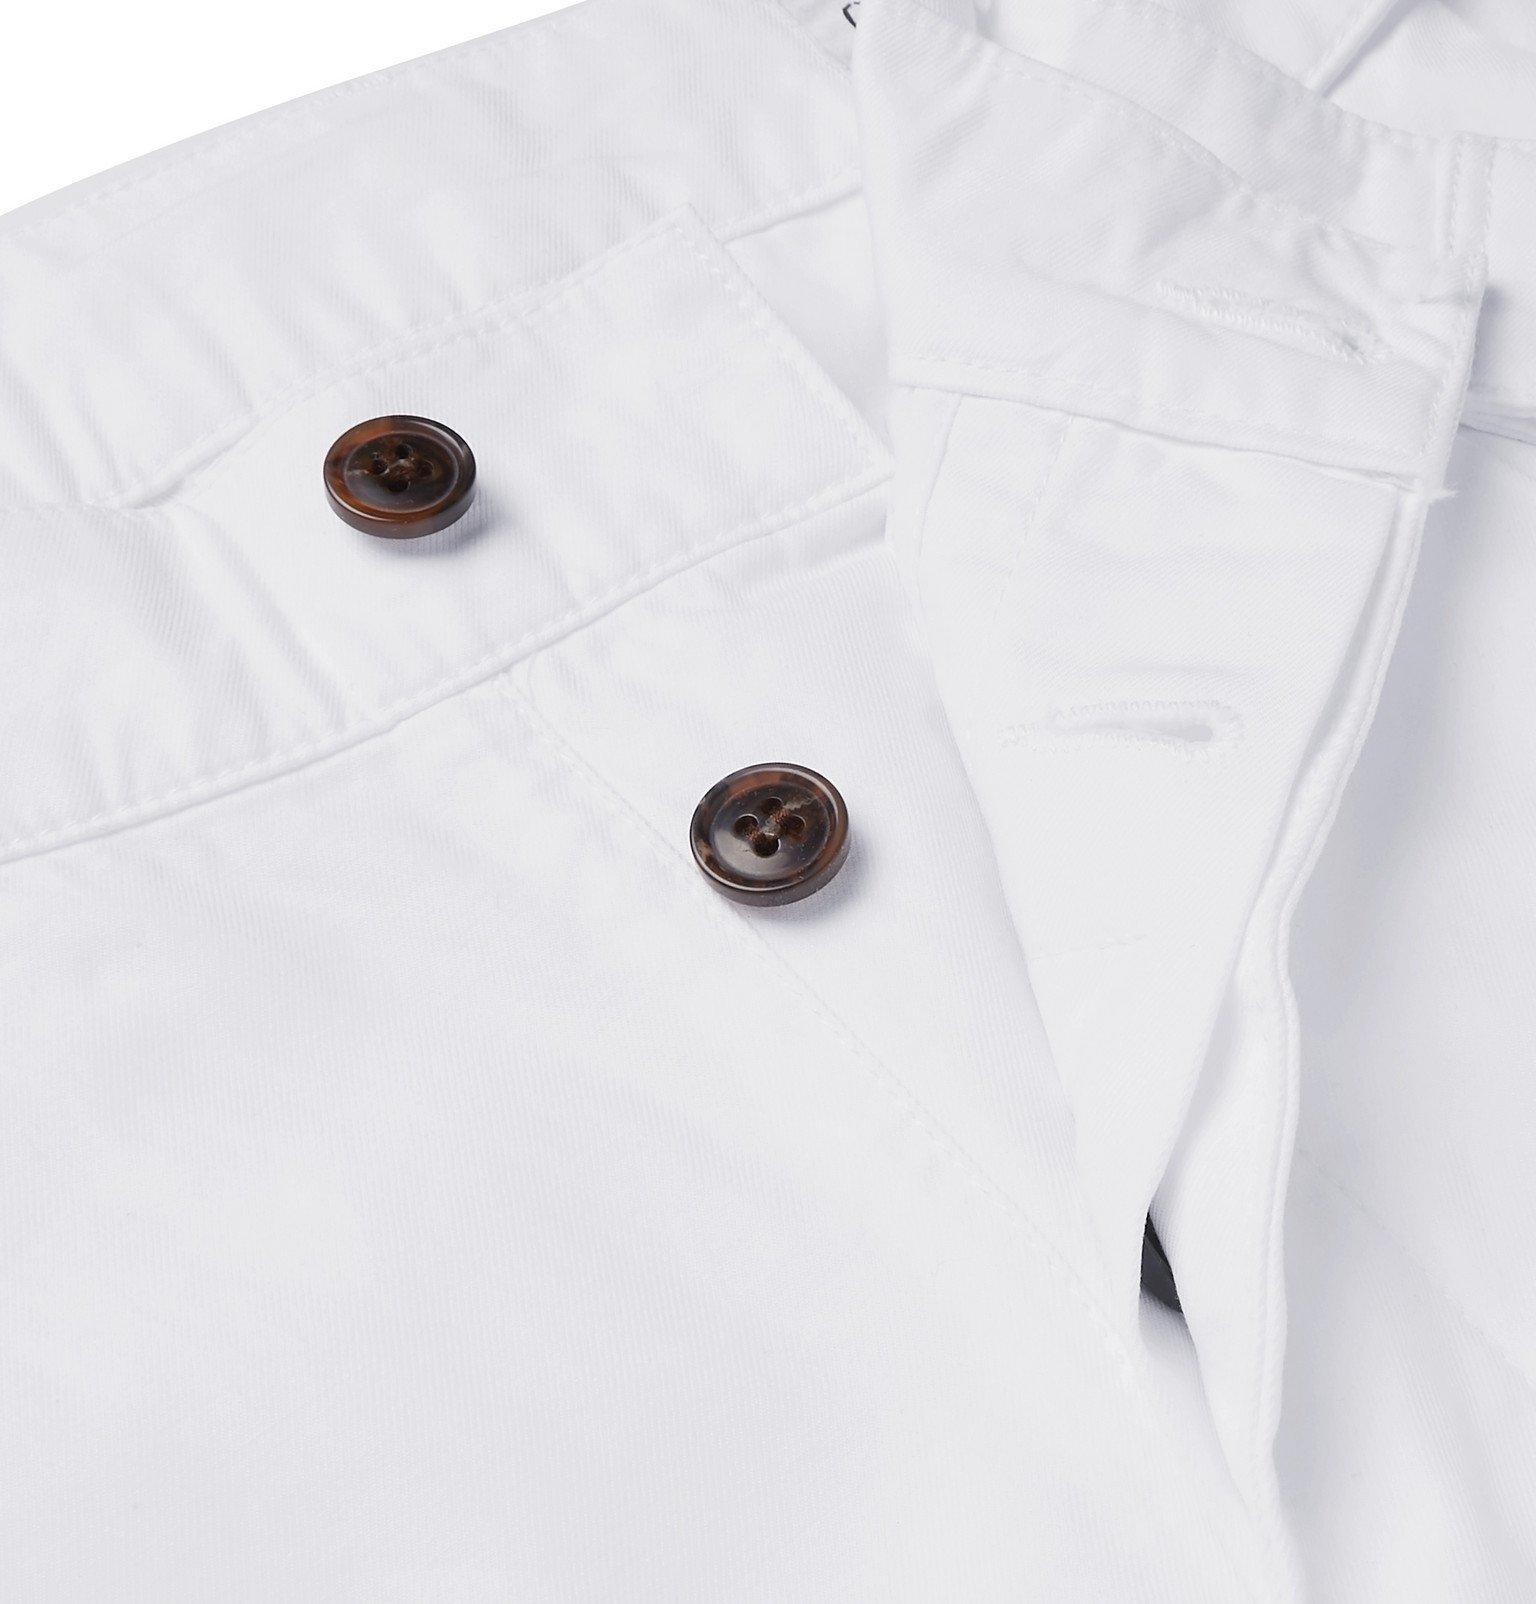 Officine Generale - Luigi Tapered Pleated Cotton Chinos - White